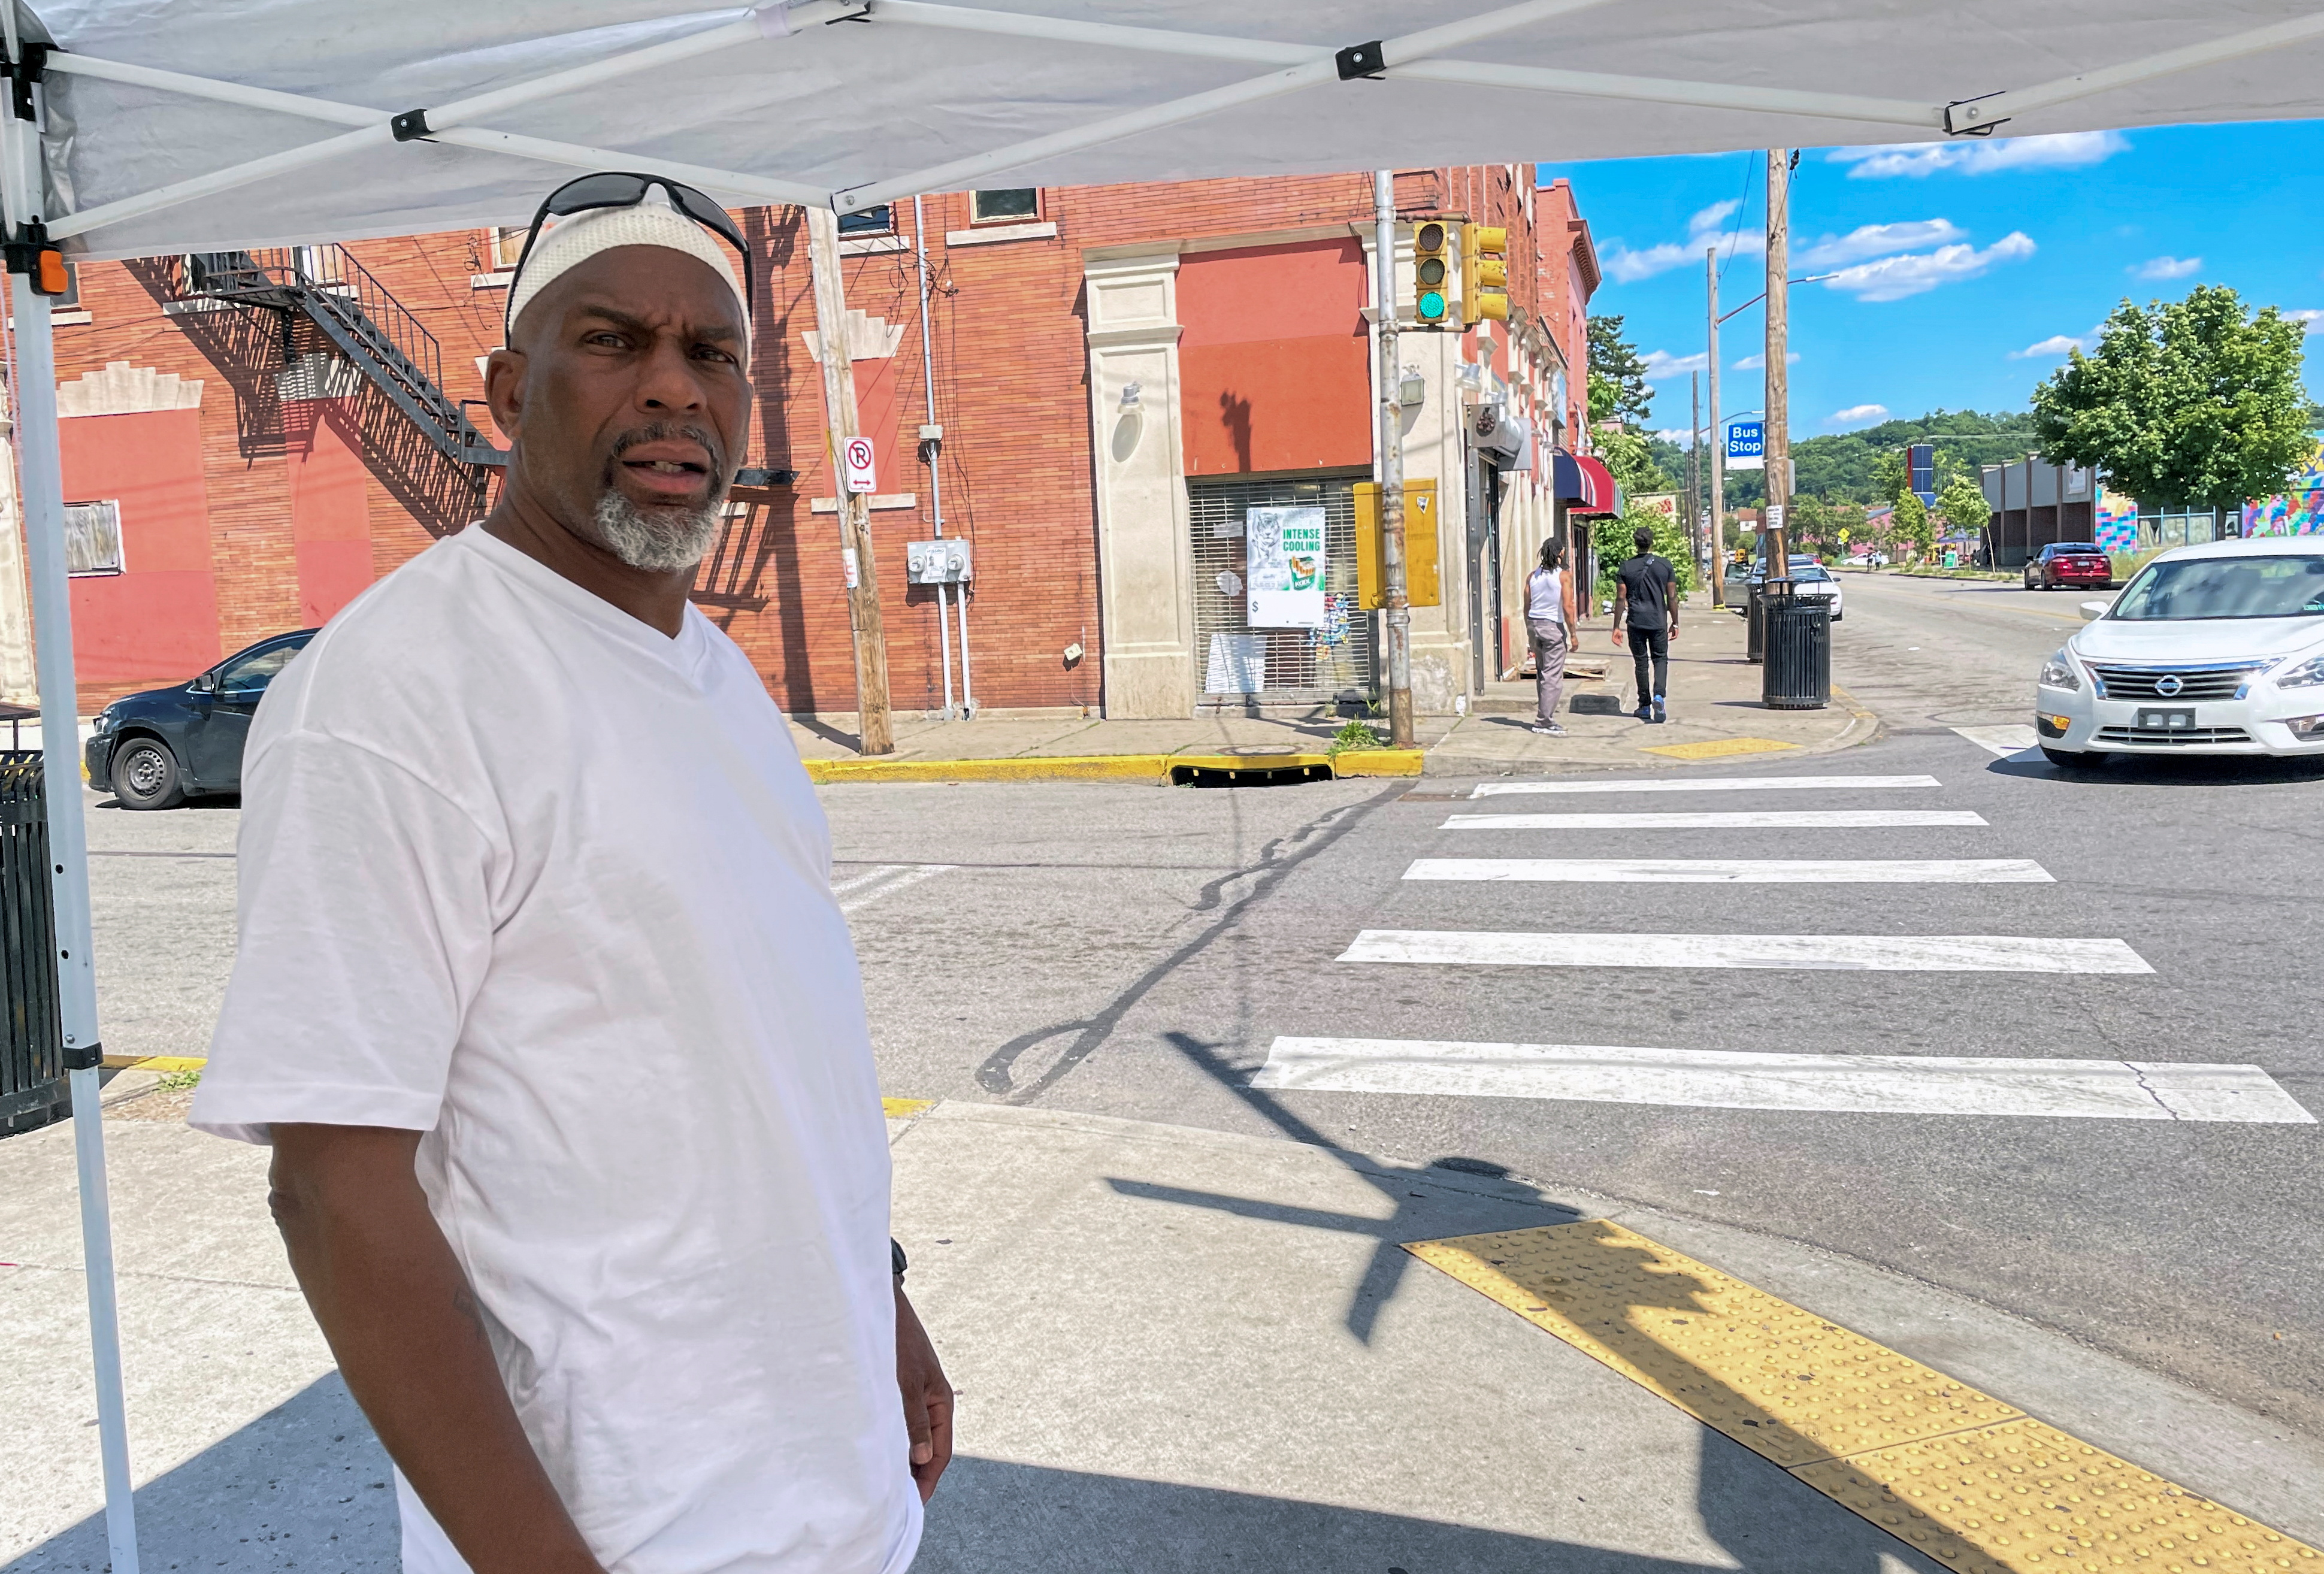 Street vendor Akeem Everett stands near Frankstown Avenue in Pittsburgh, Pennsylvania, U.S. June 23, 2021. REUTERS/Andy Sullivan